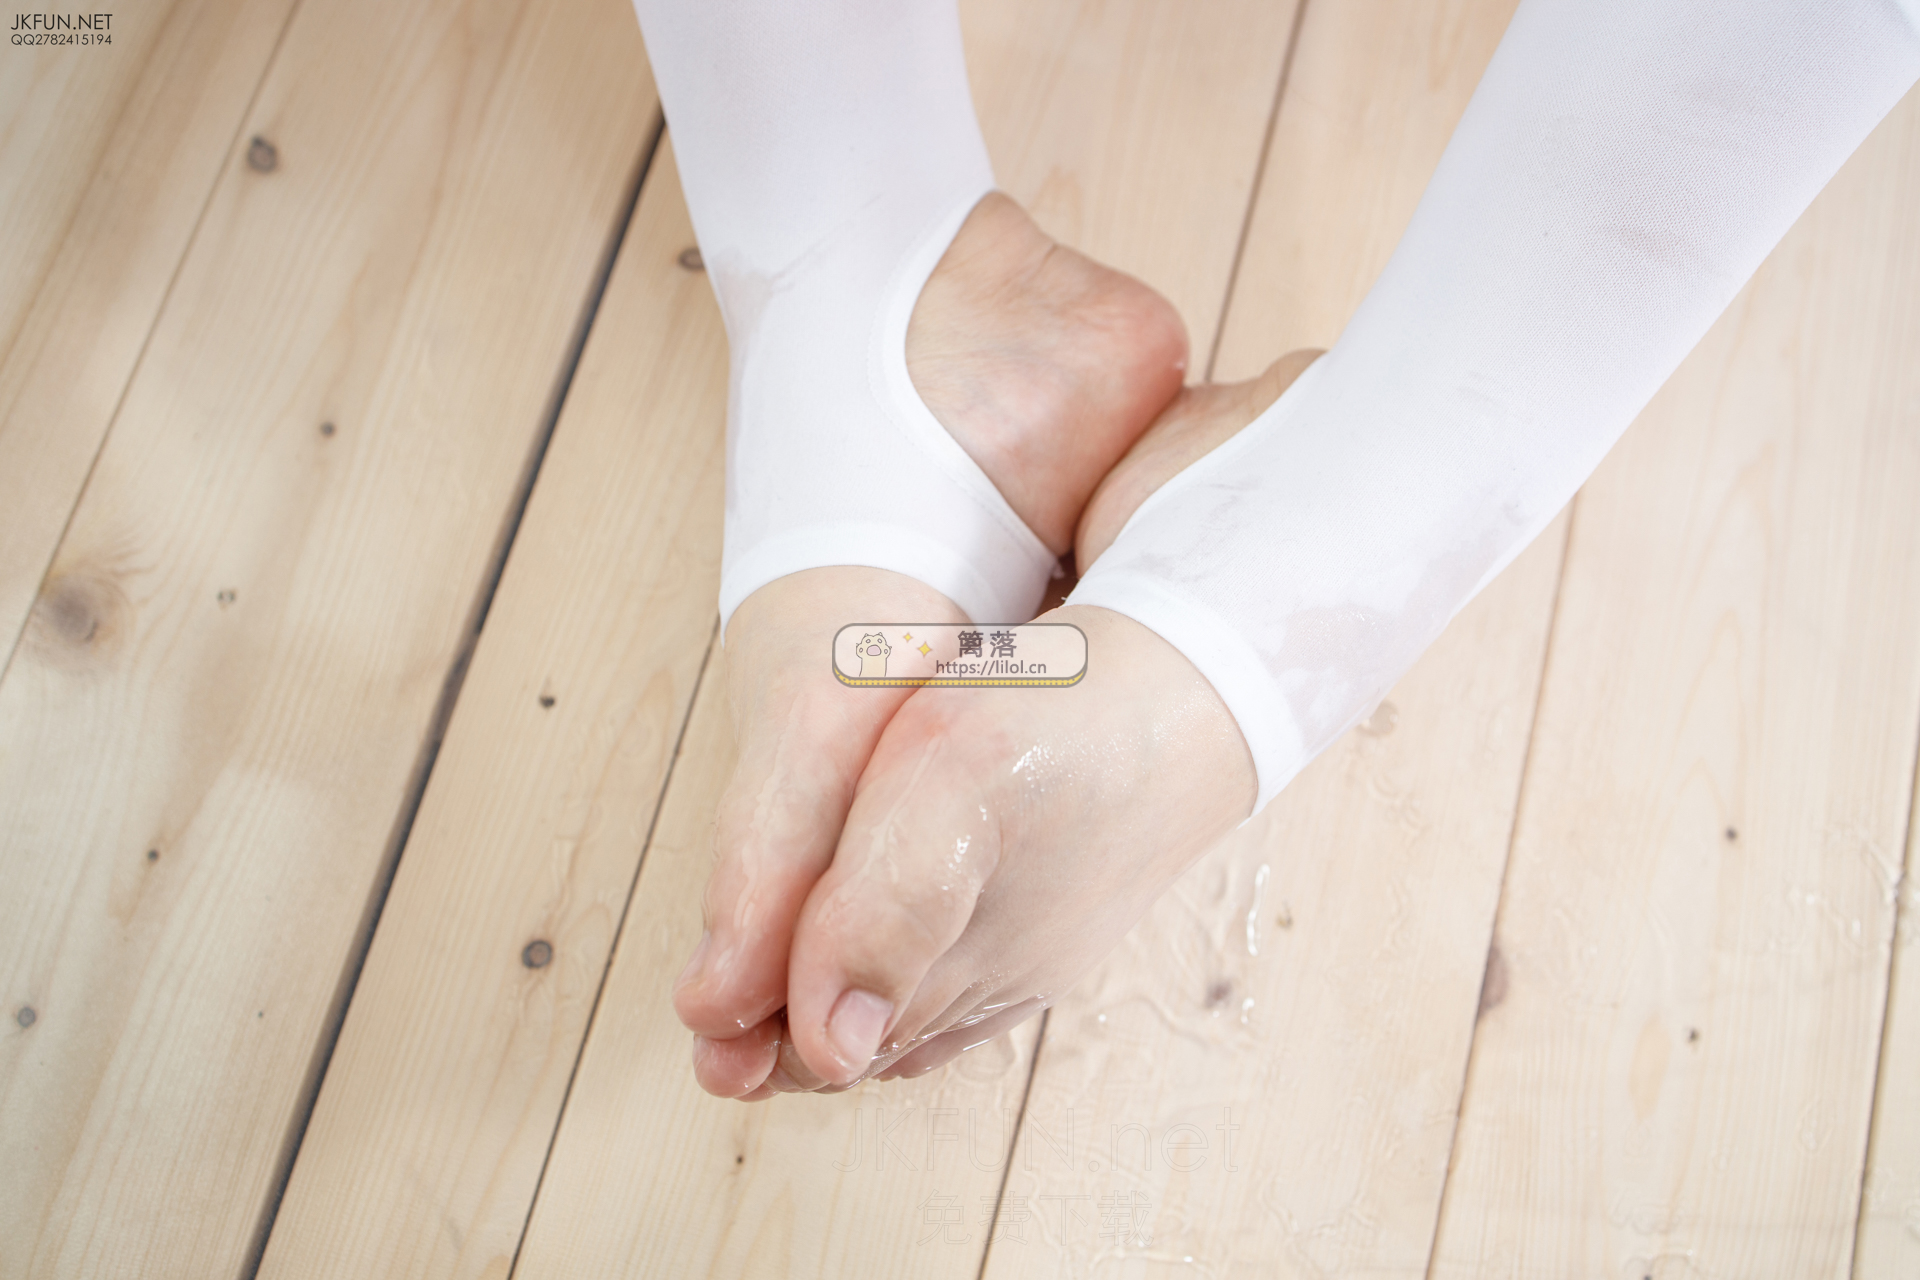 【JKFUN系列】森萝财团写真 JKFUN-010 超性感蓝色紧身吊带室内写真 [115图-1视频-2.9GB] JKFUN系列 第7张